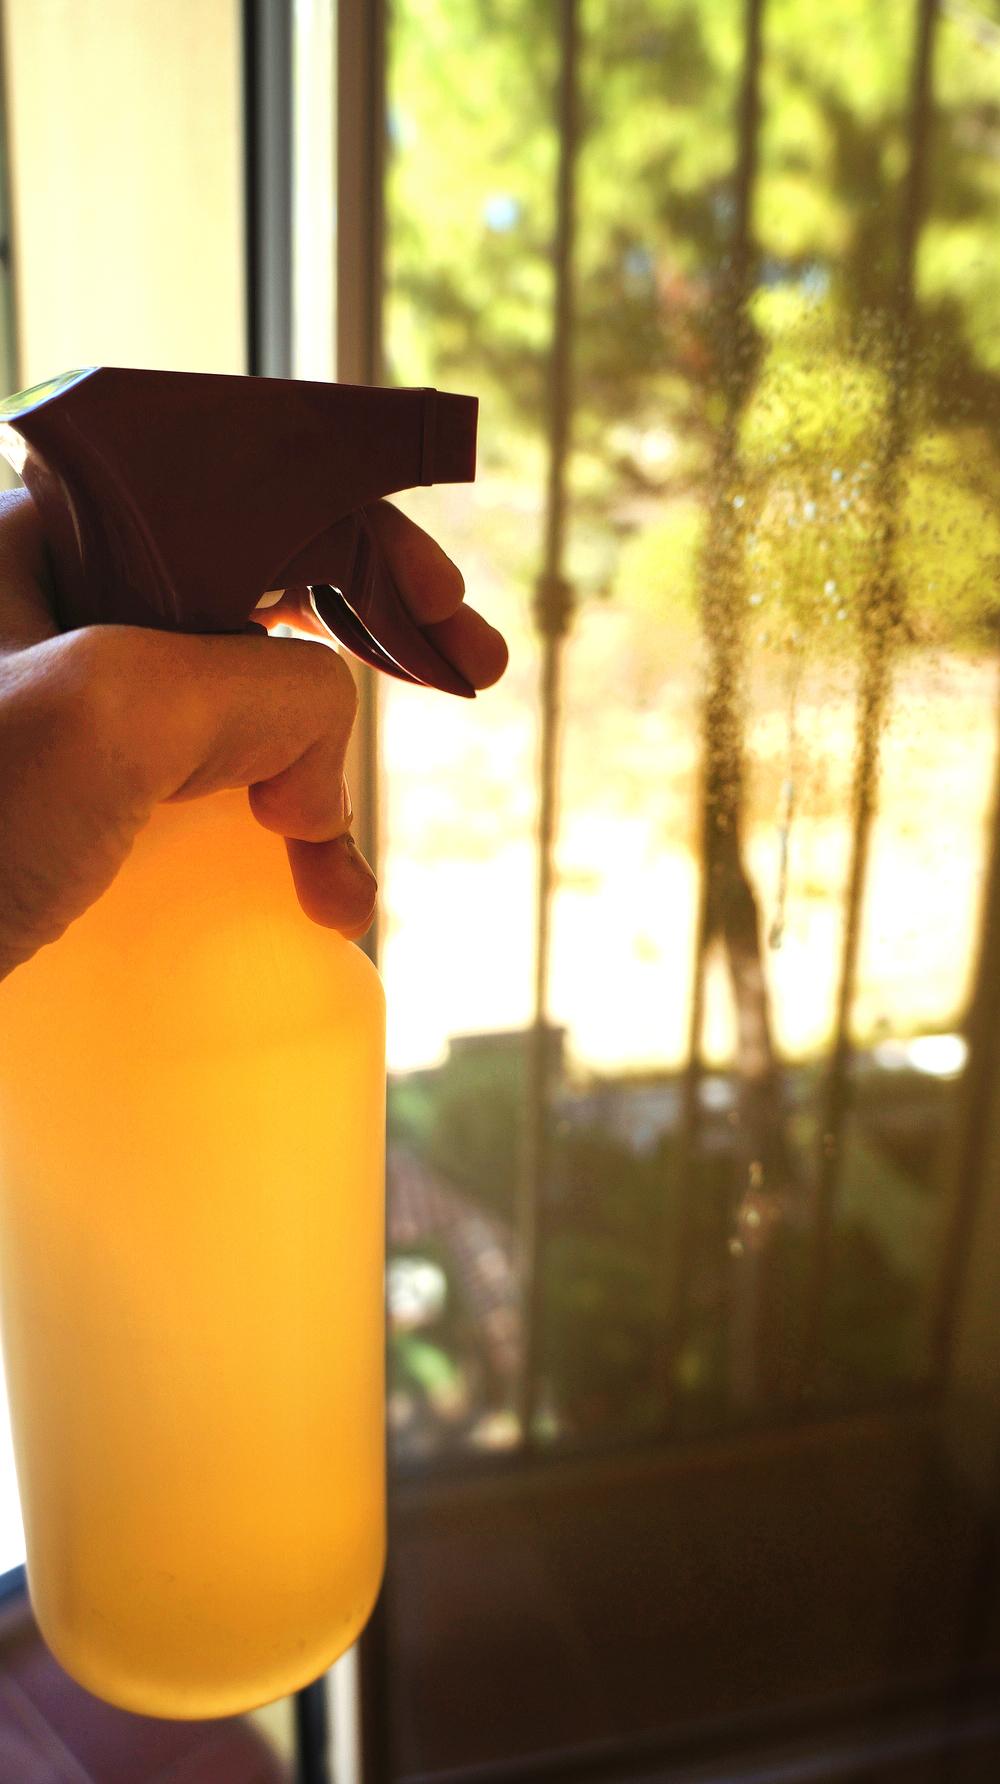 Jabón Líquido, ideal para ventanas